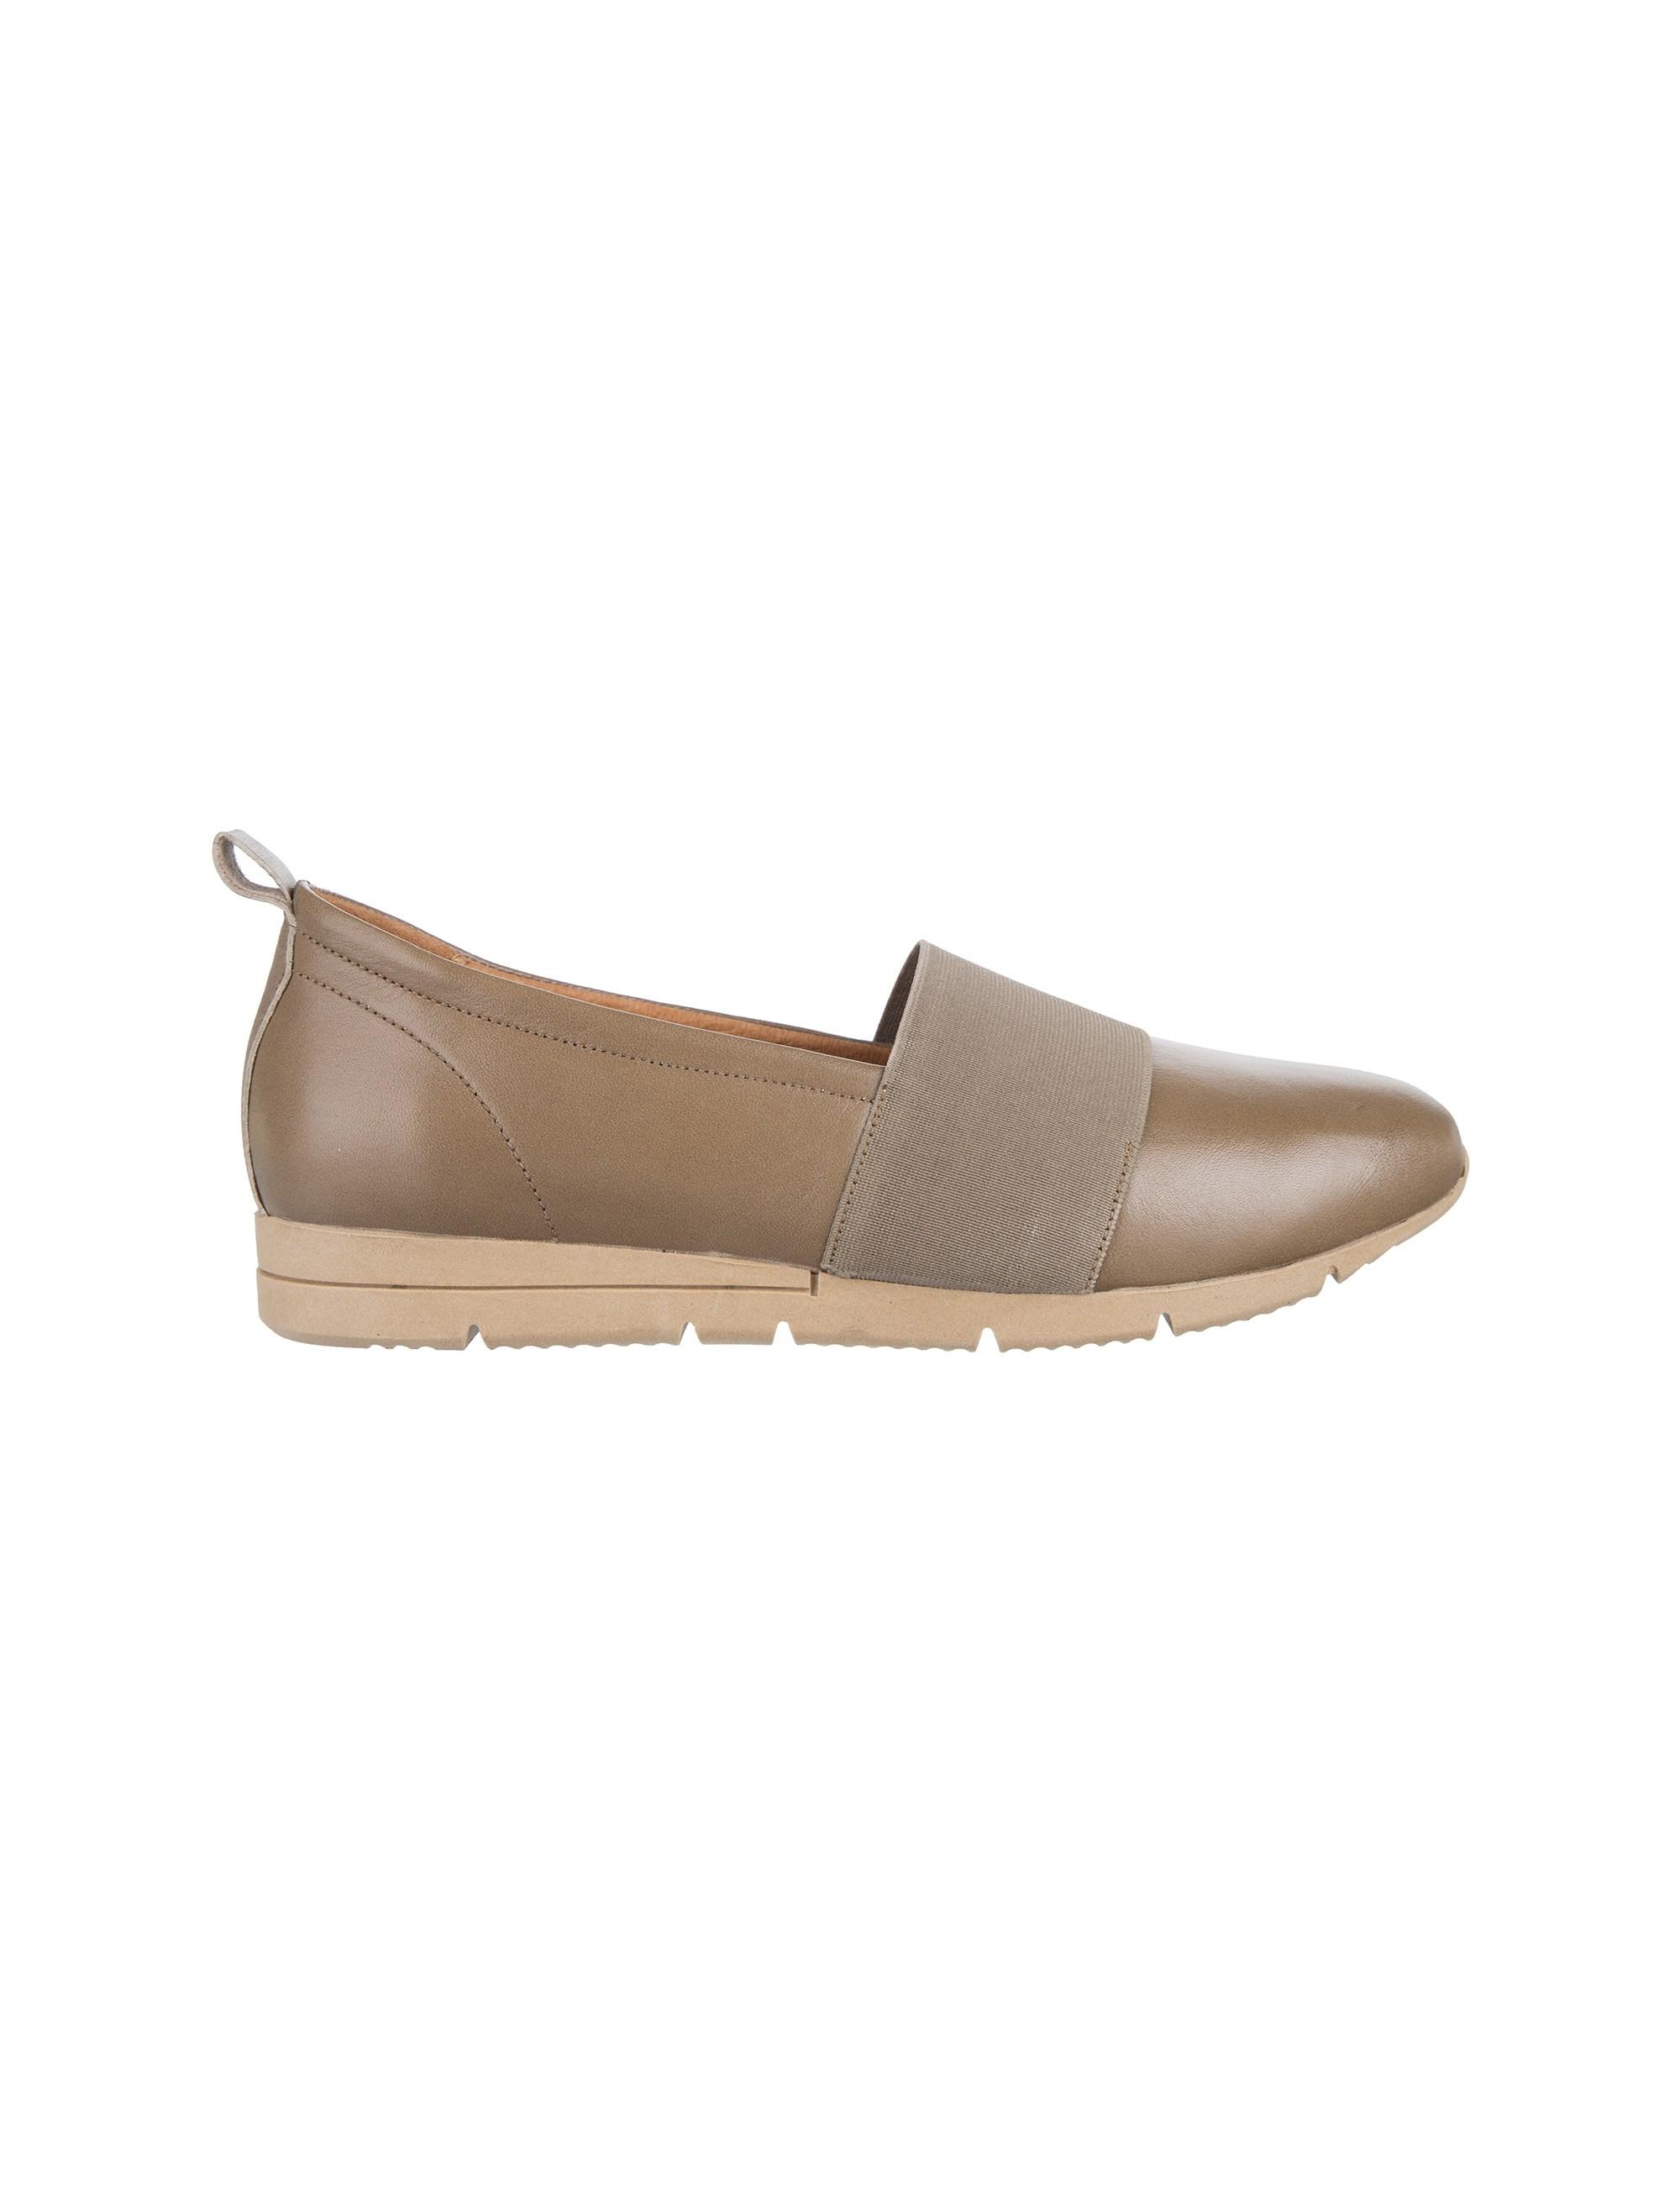 کفش تخت چرم زنانه - برتونیکس